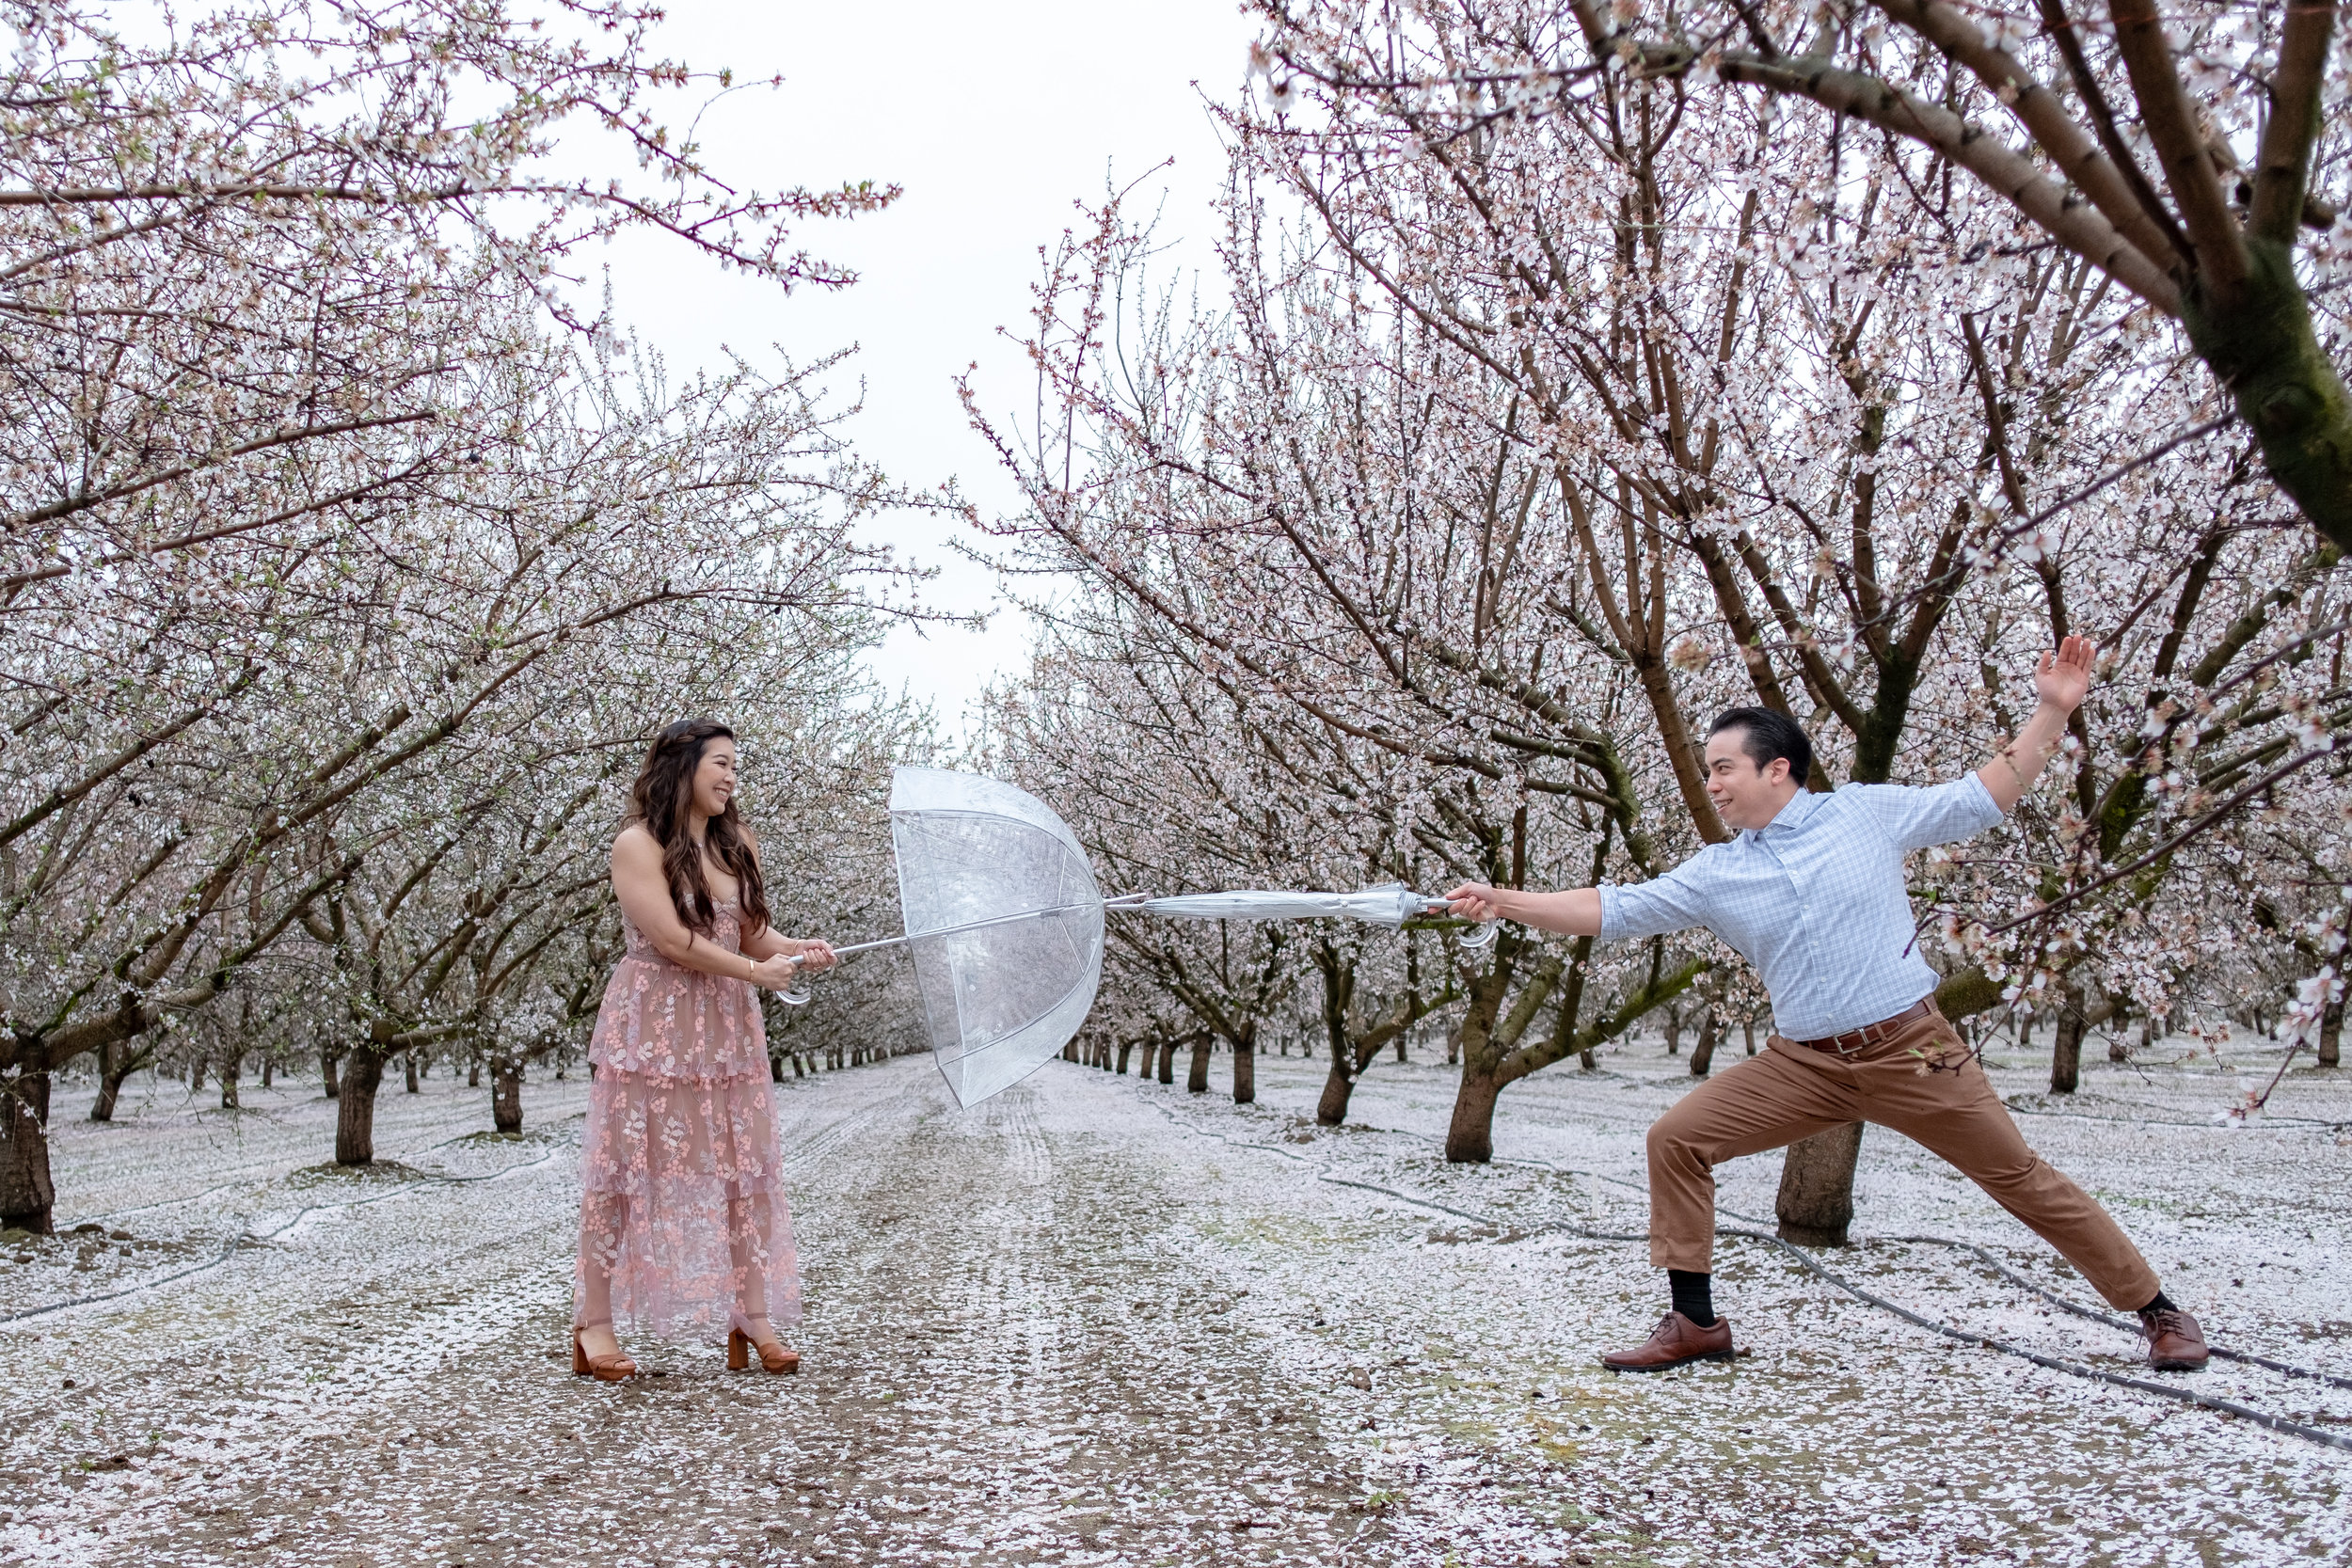 20190302 - Almond Farm Engagement - 0308.JPG